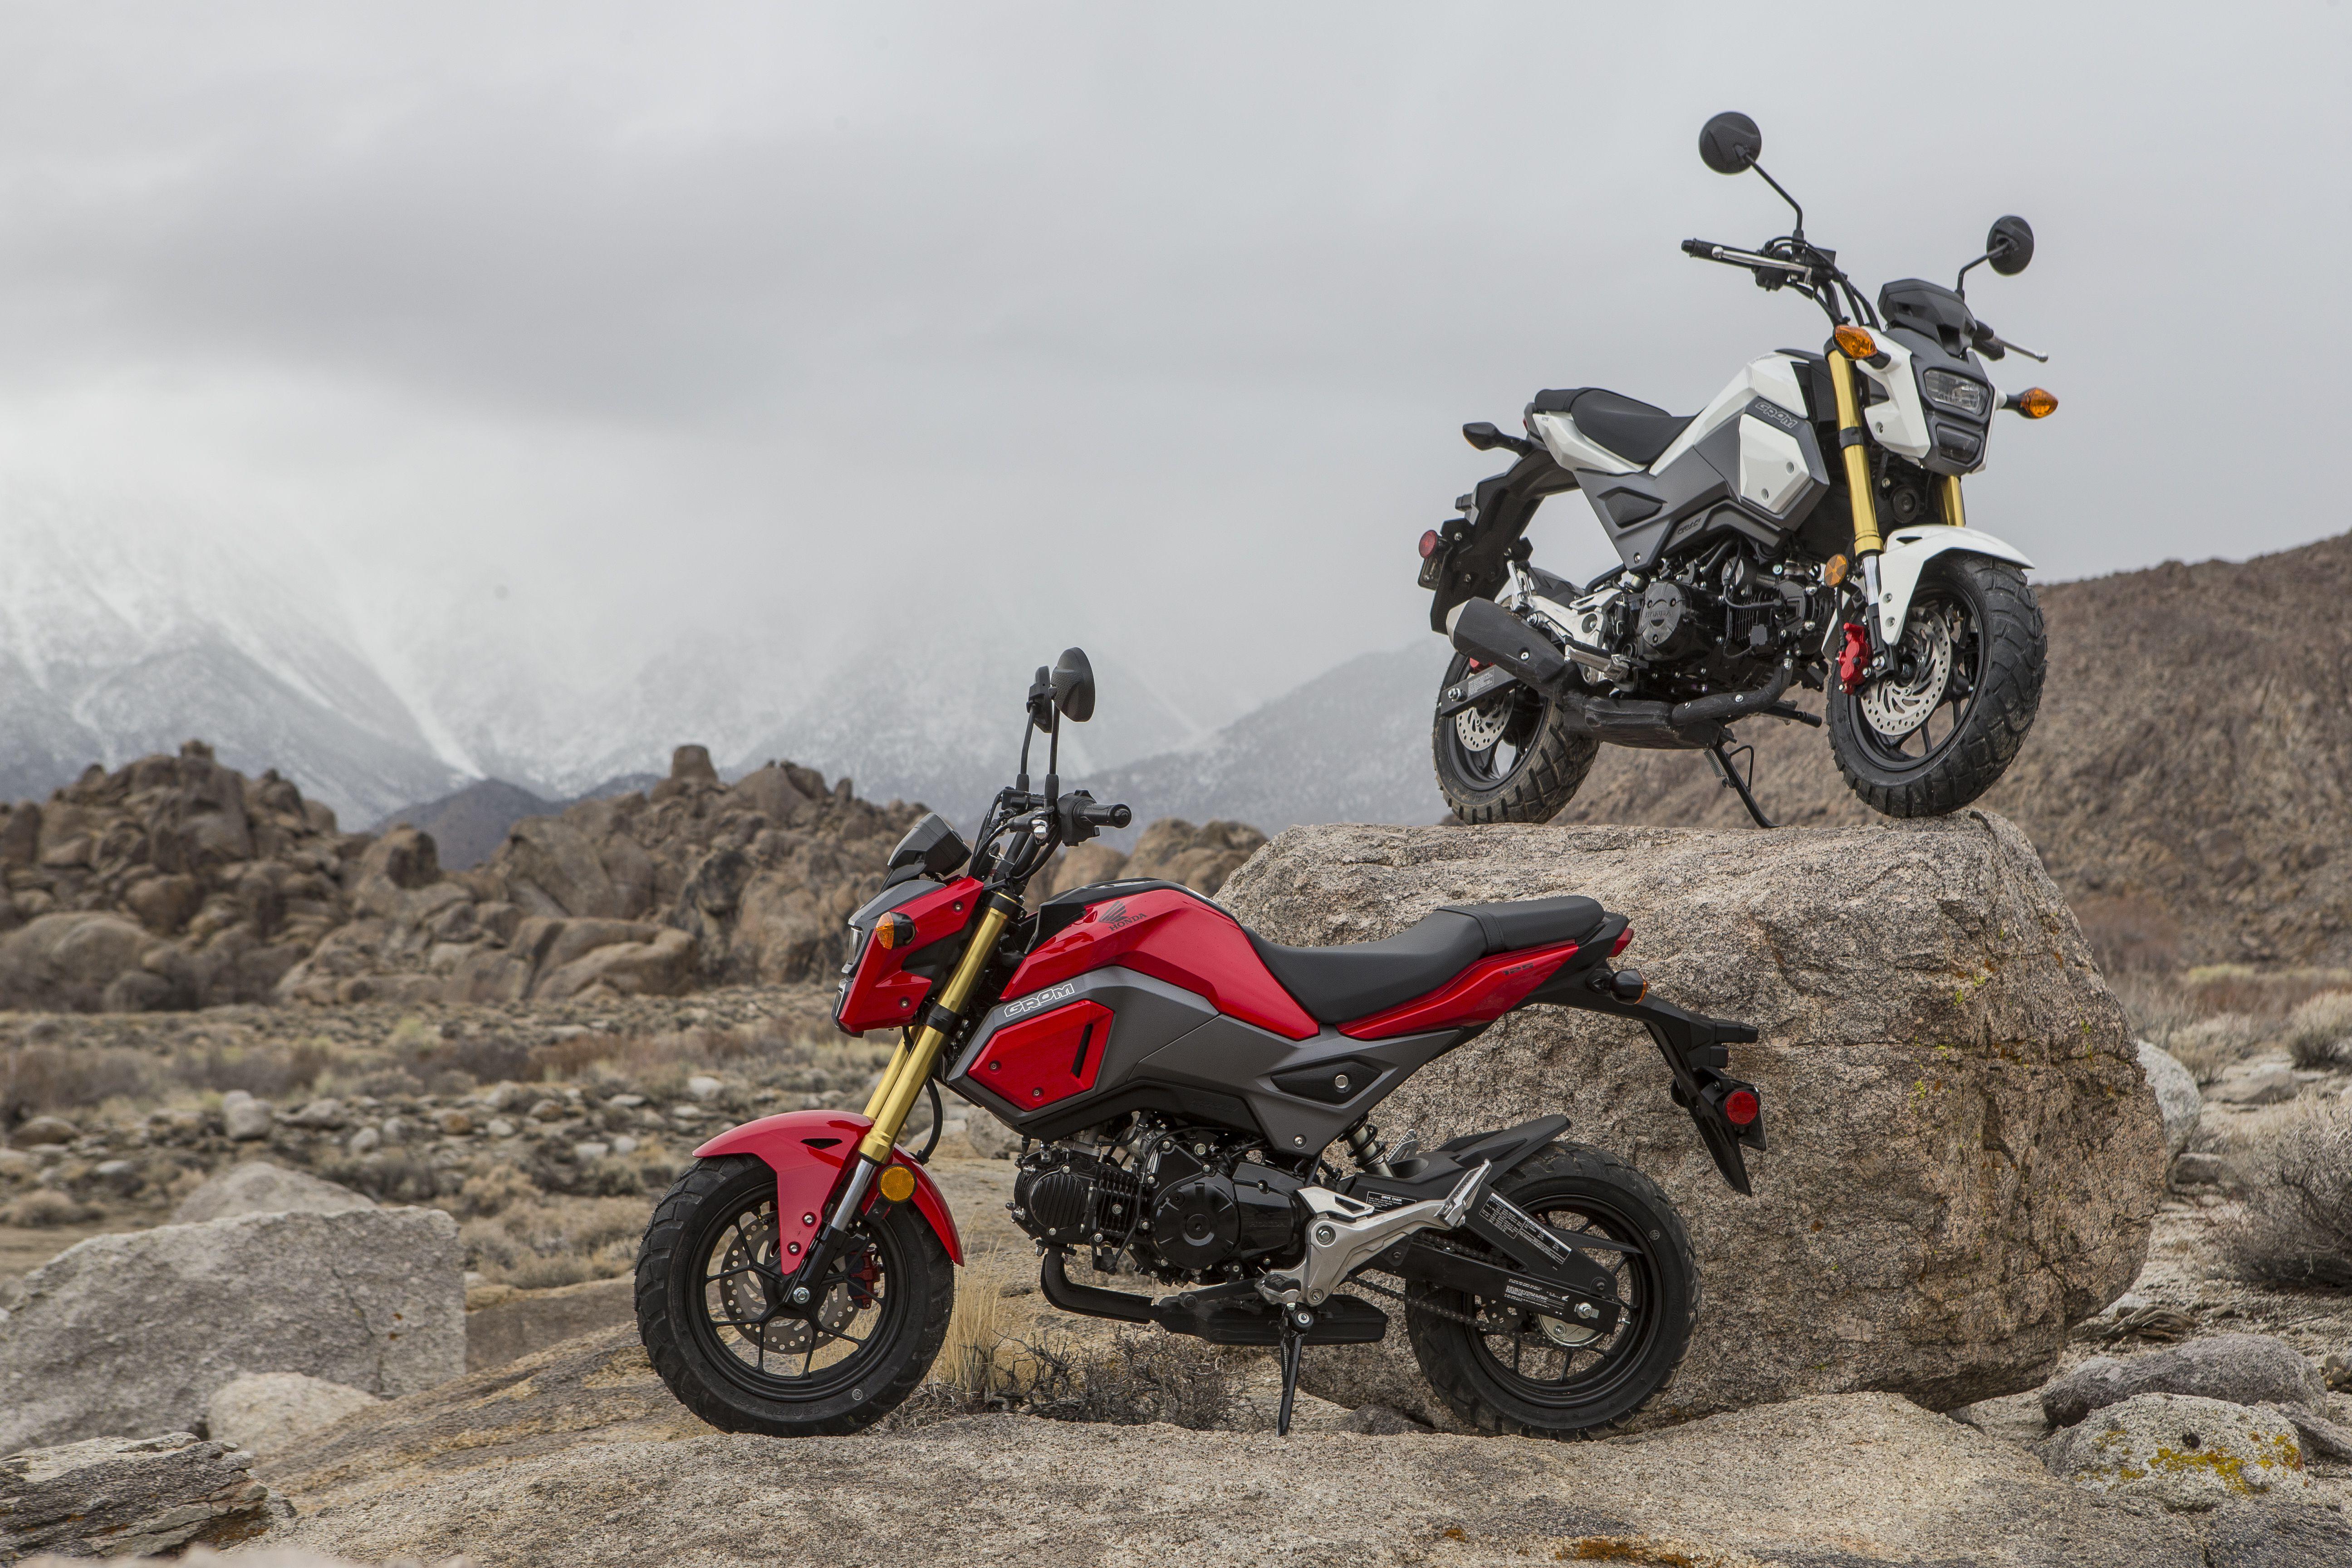 Honda Grom Off-Road Adventure Motorcycle Fun Trip | Cycle World